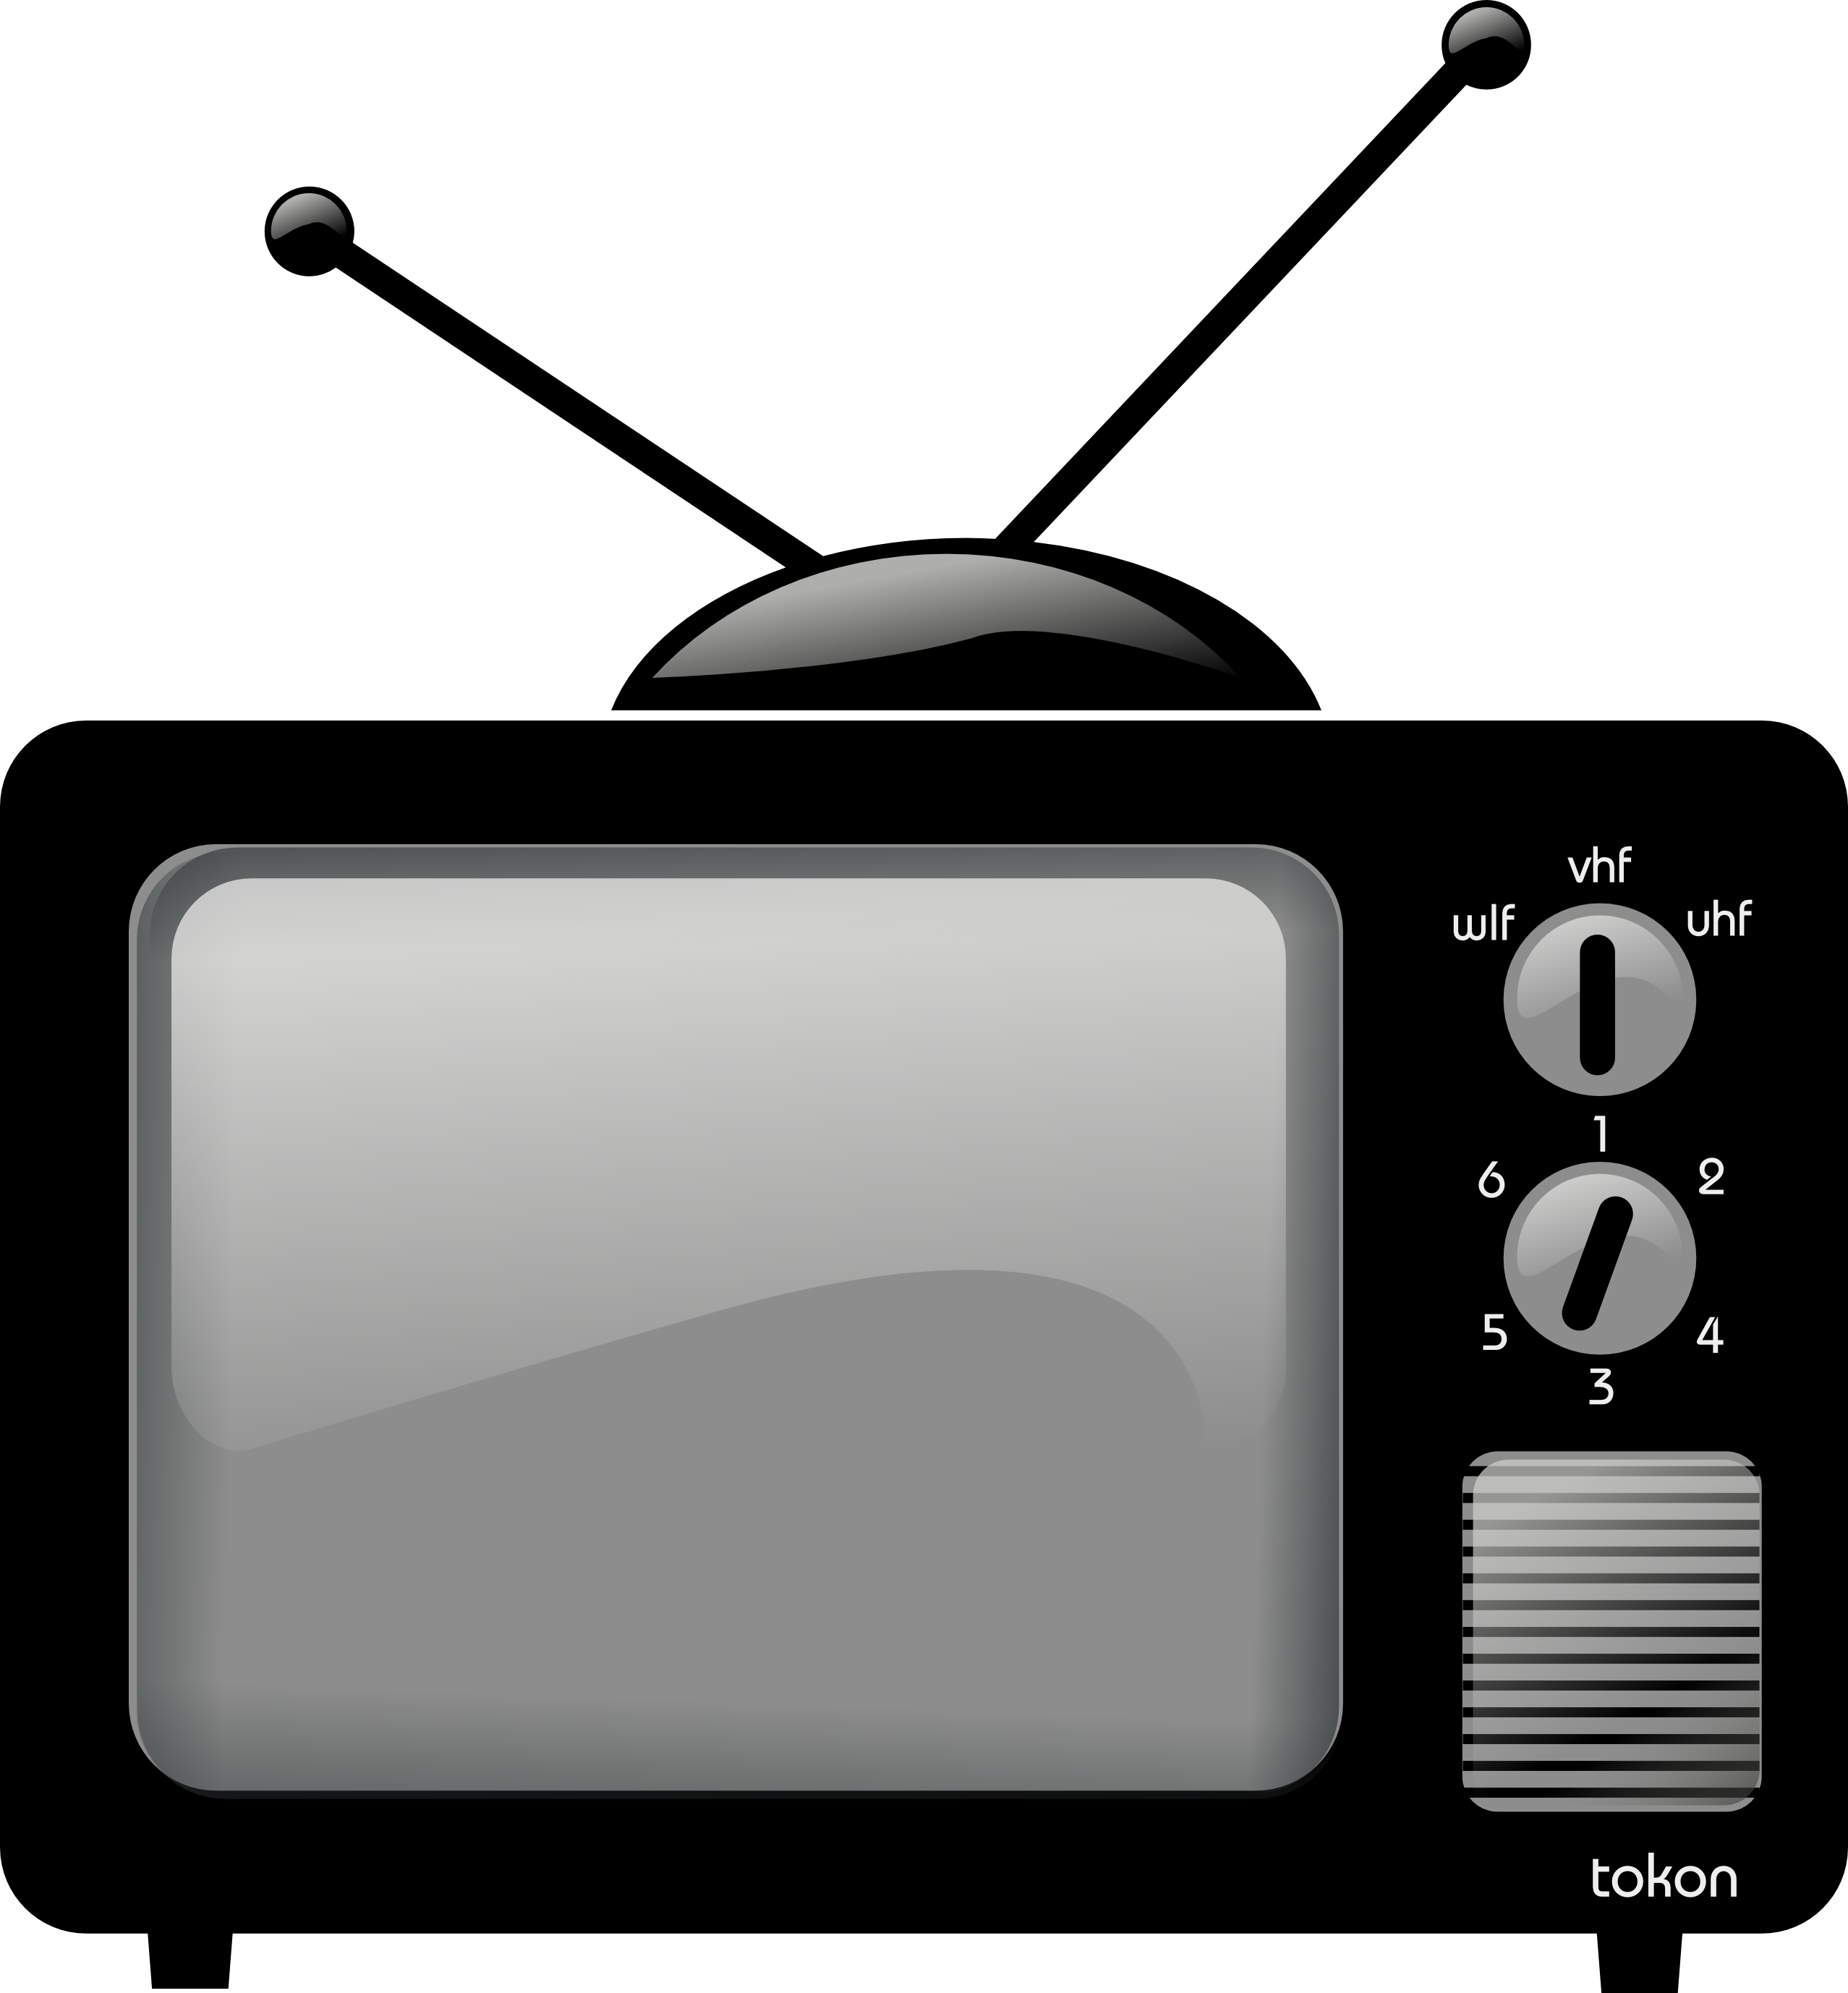 Телевизор картинки вектор